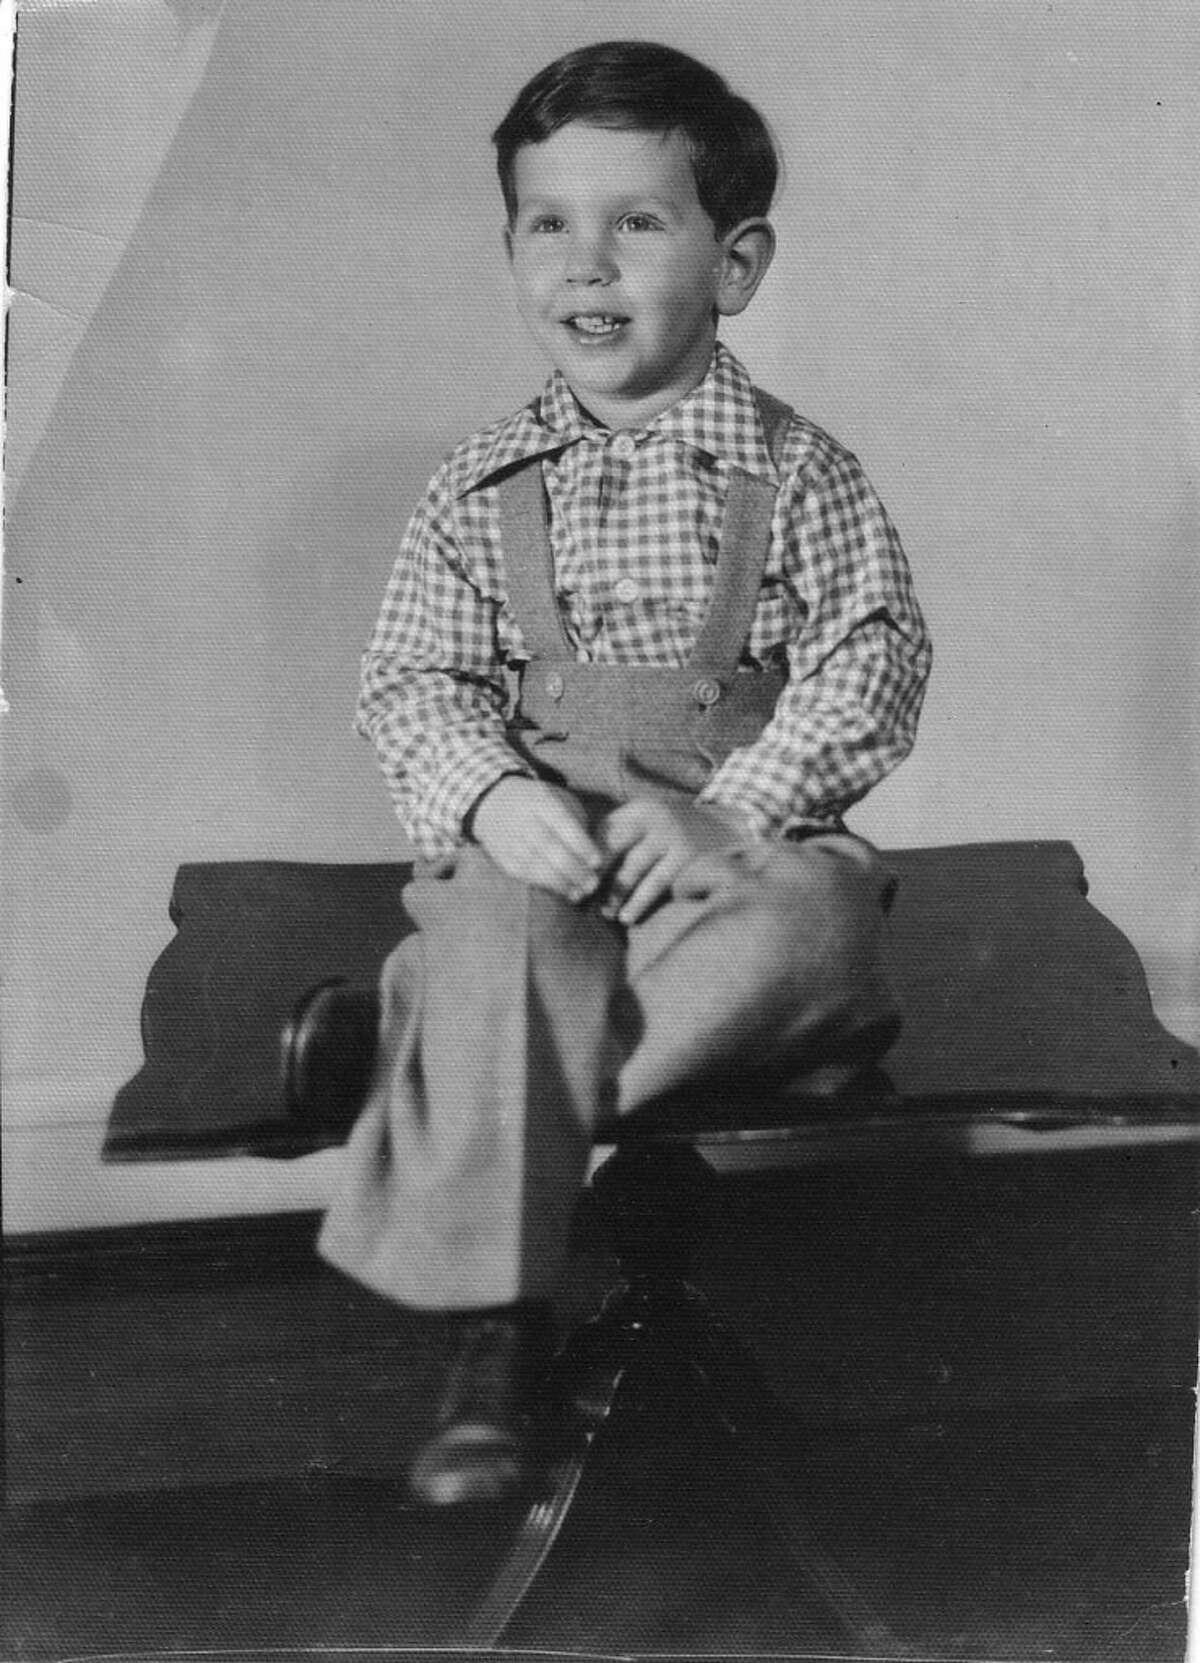 Larry Ellison at age 2.